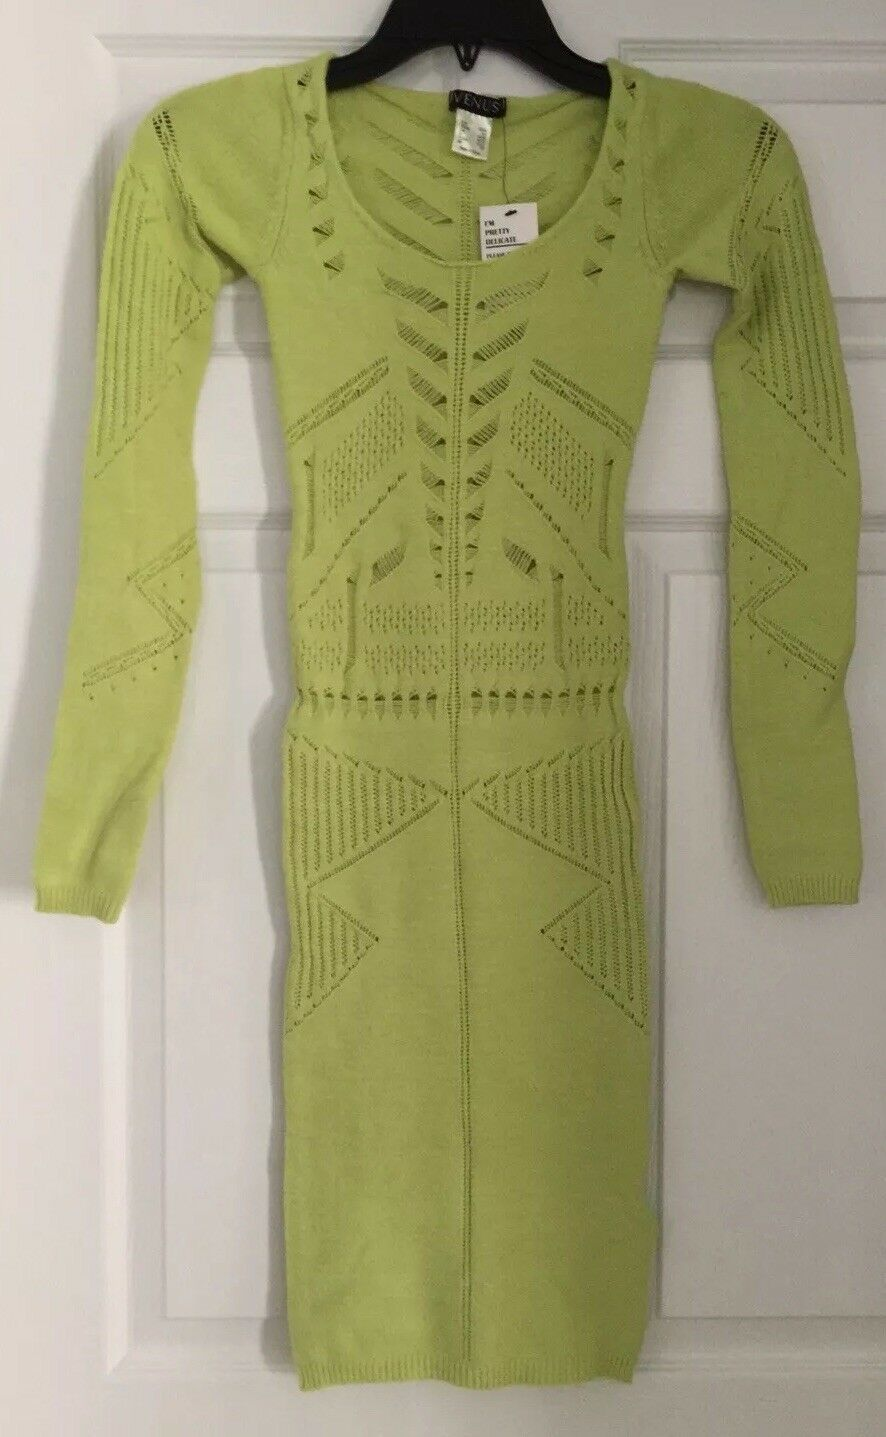 NWT Venus Neon Green/Yellow Sweater Dress with Cutouts - XS ...